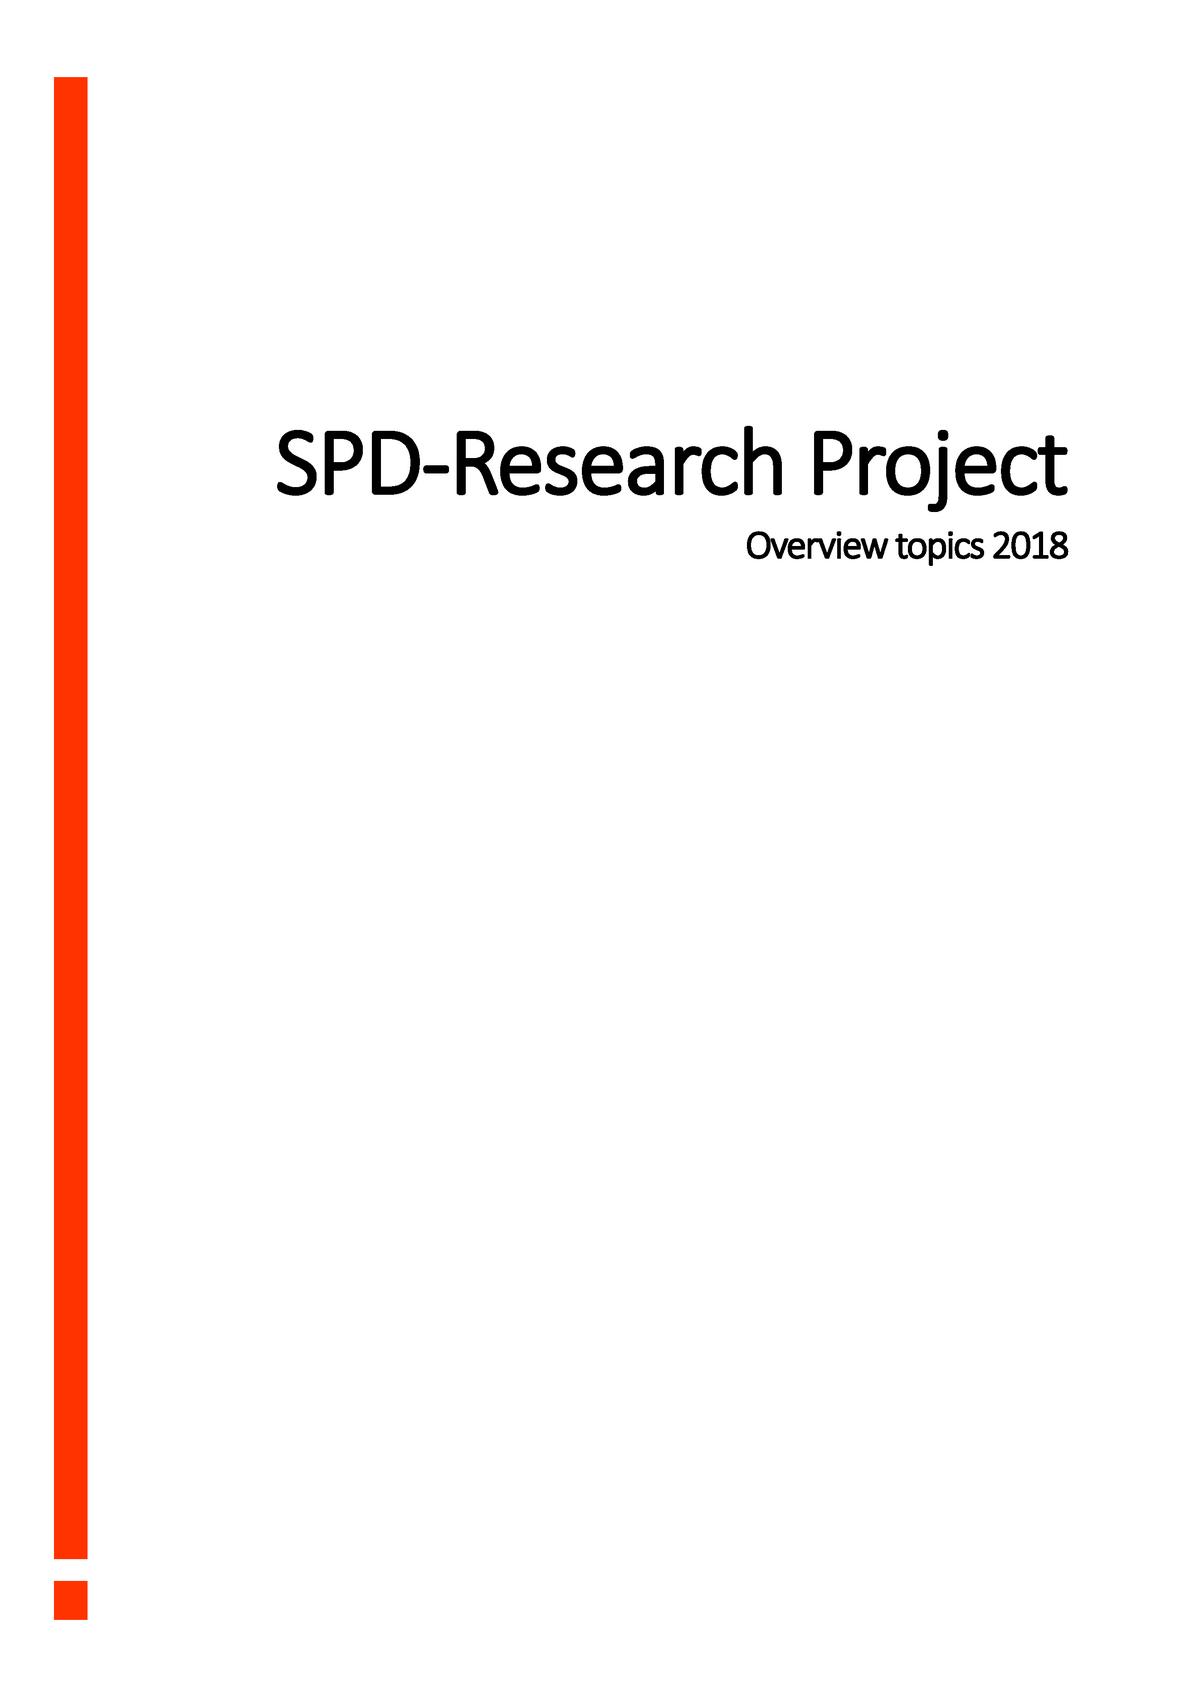 Overview topics 2018 - Research track beschrijvingen